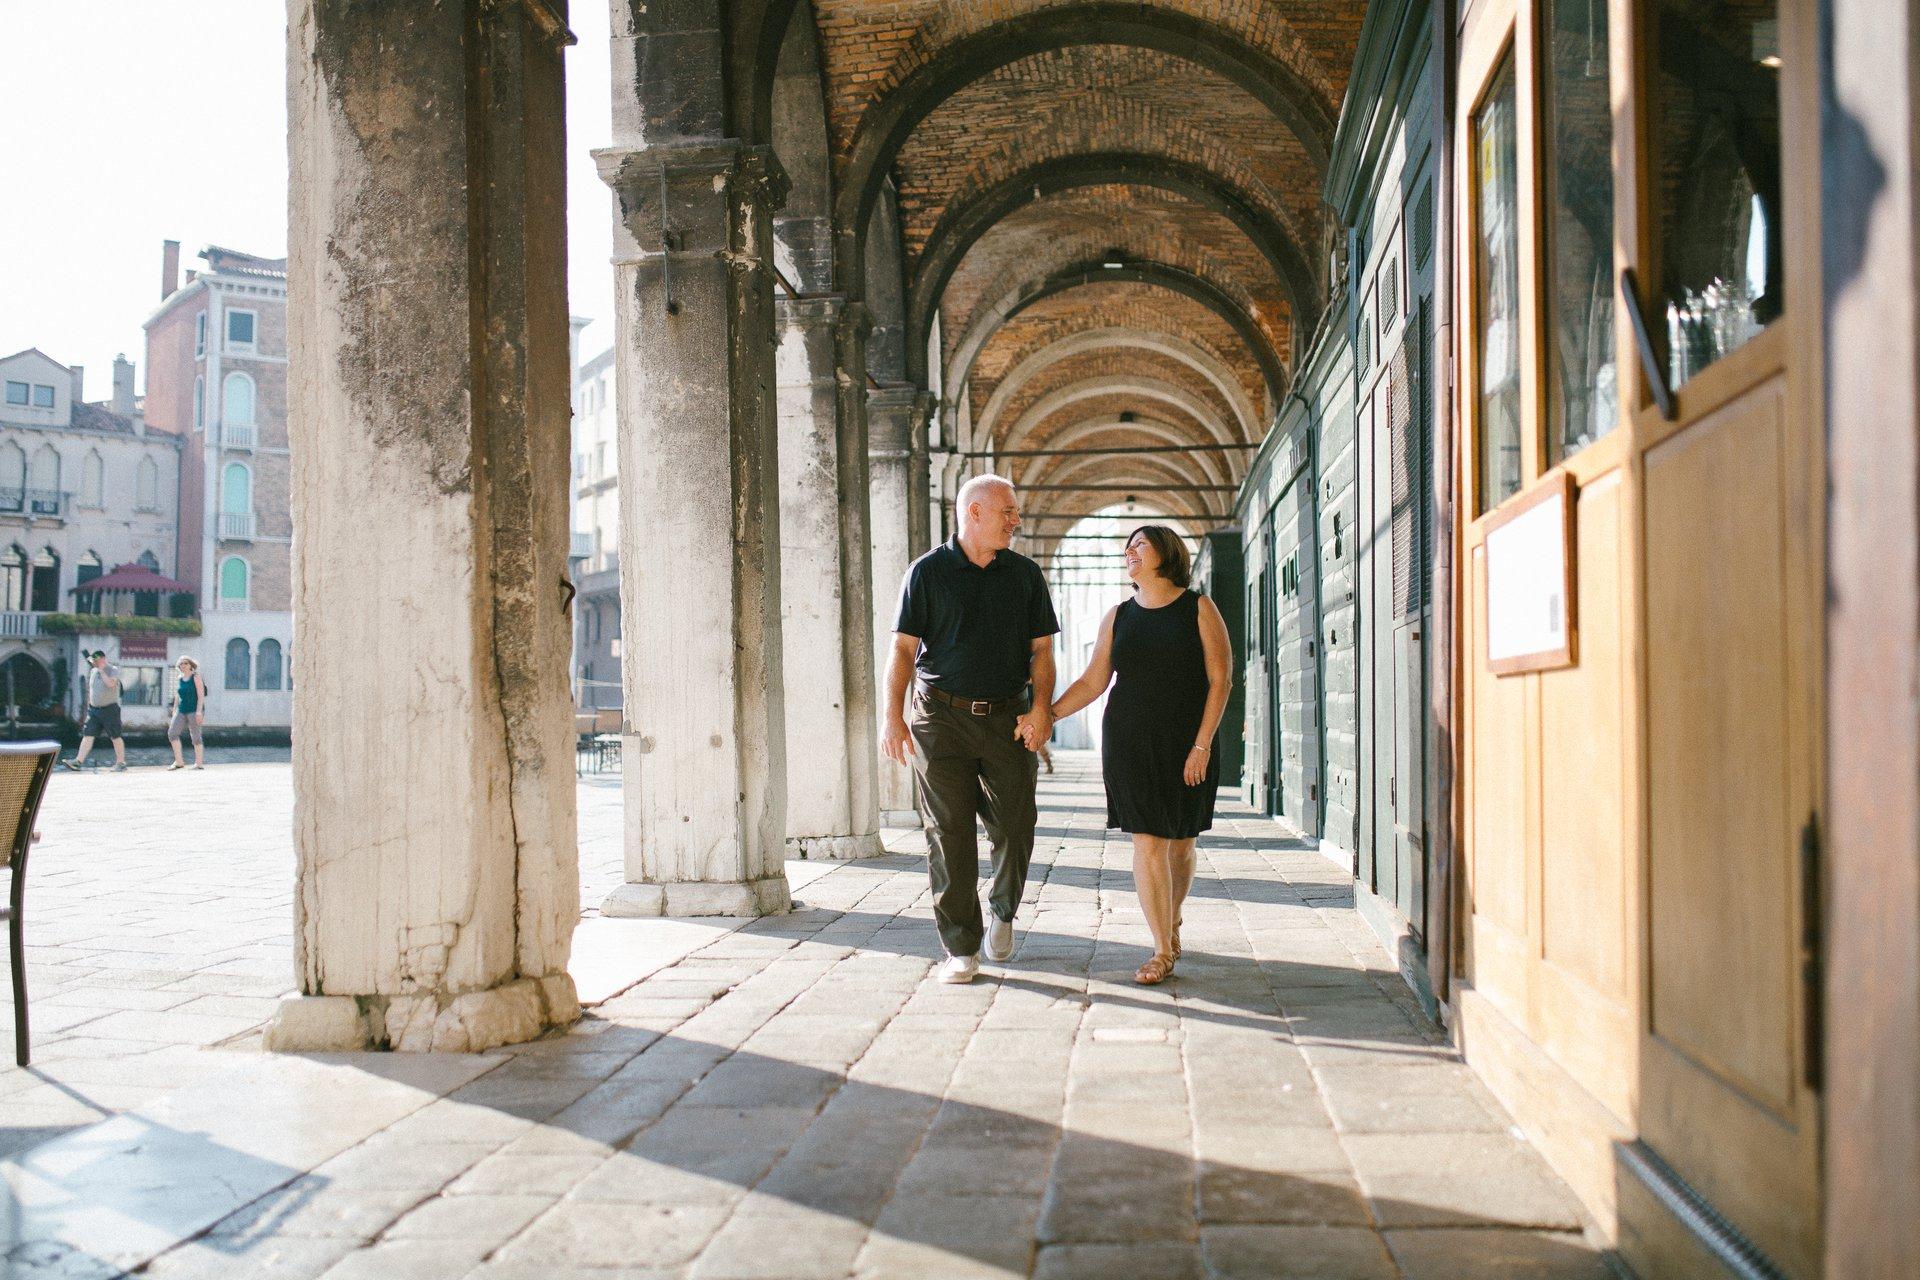 Venice-Italy-travel-story-Flytographer-11